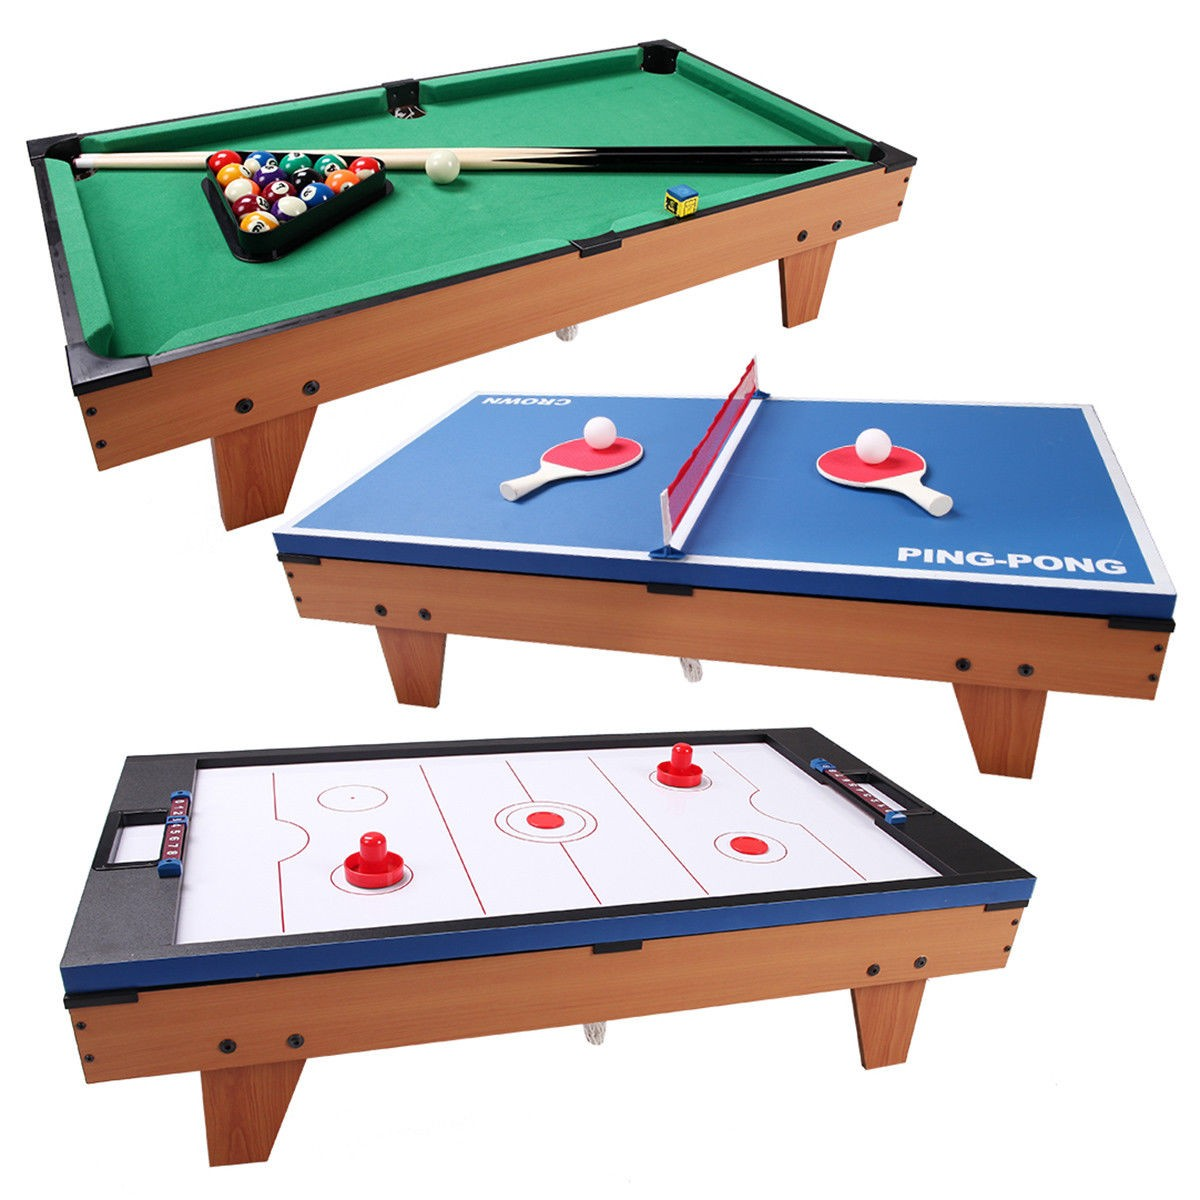 3 in 1 Air Hockey Ping Pong Billiard Multifunctional Table